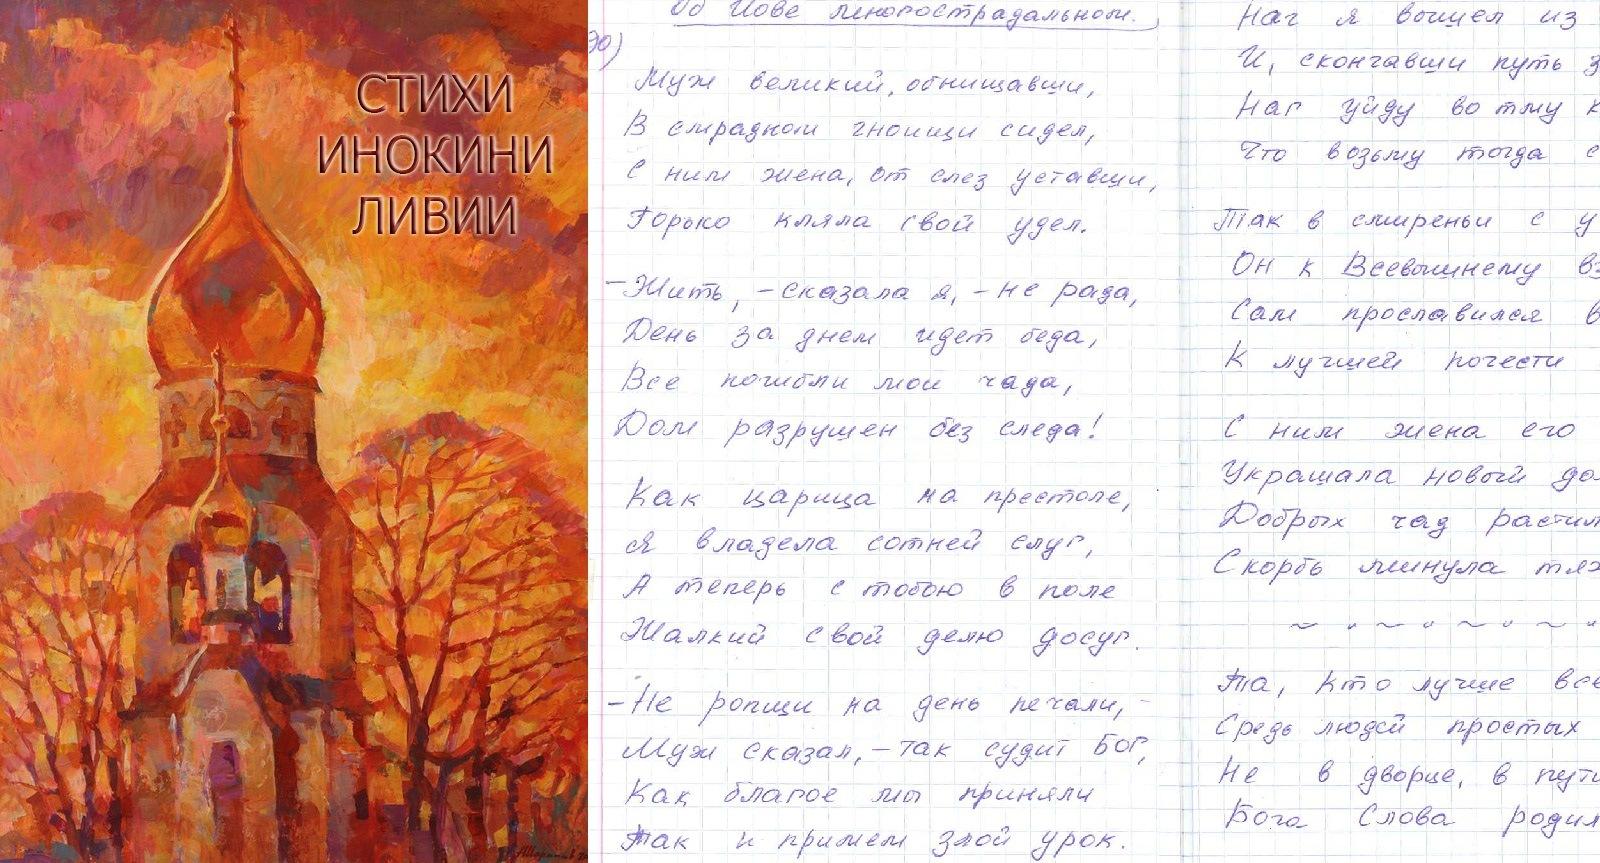 Inokinya_Liviya_Stikhi-head